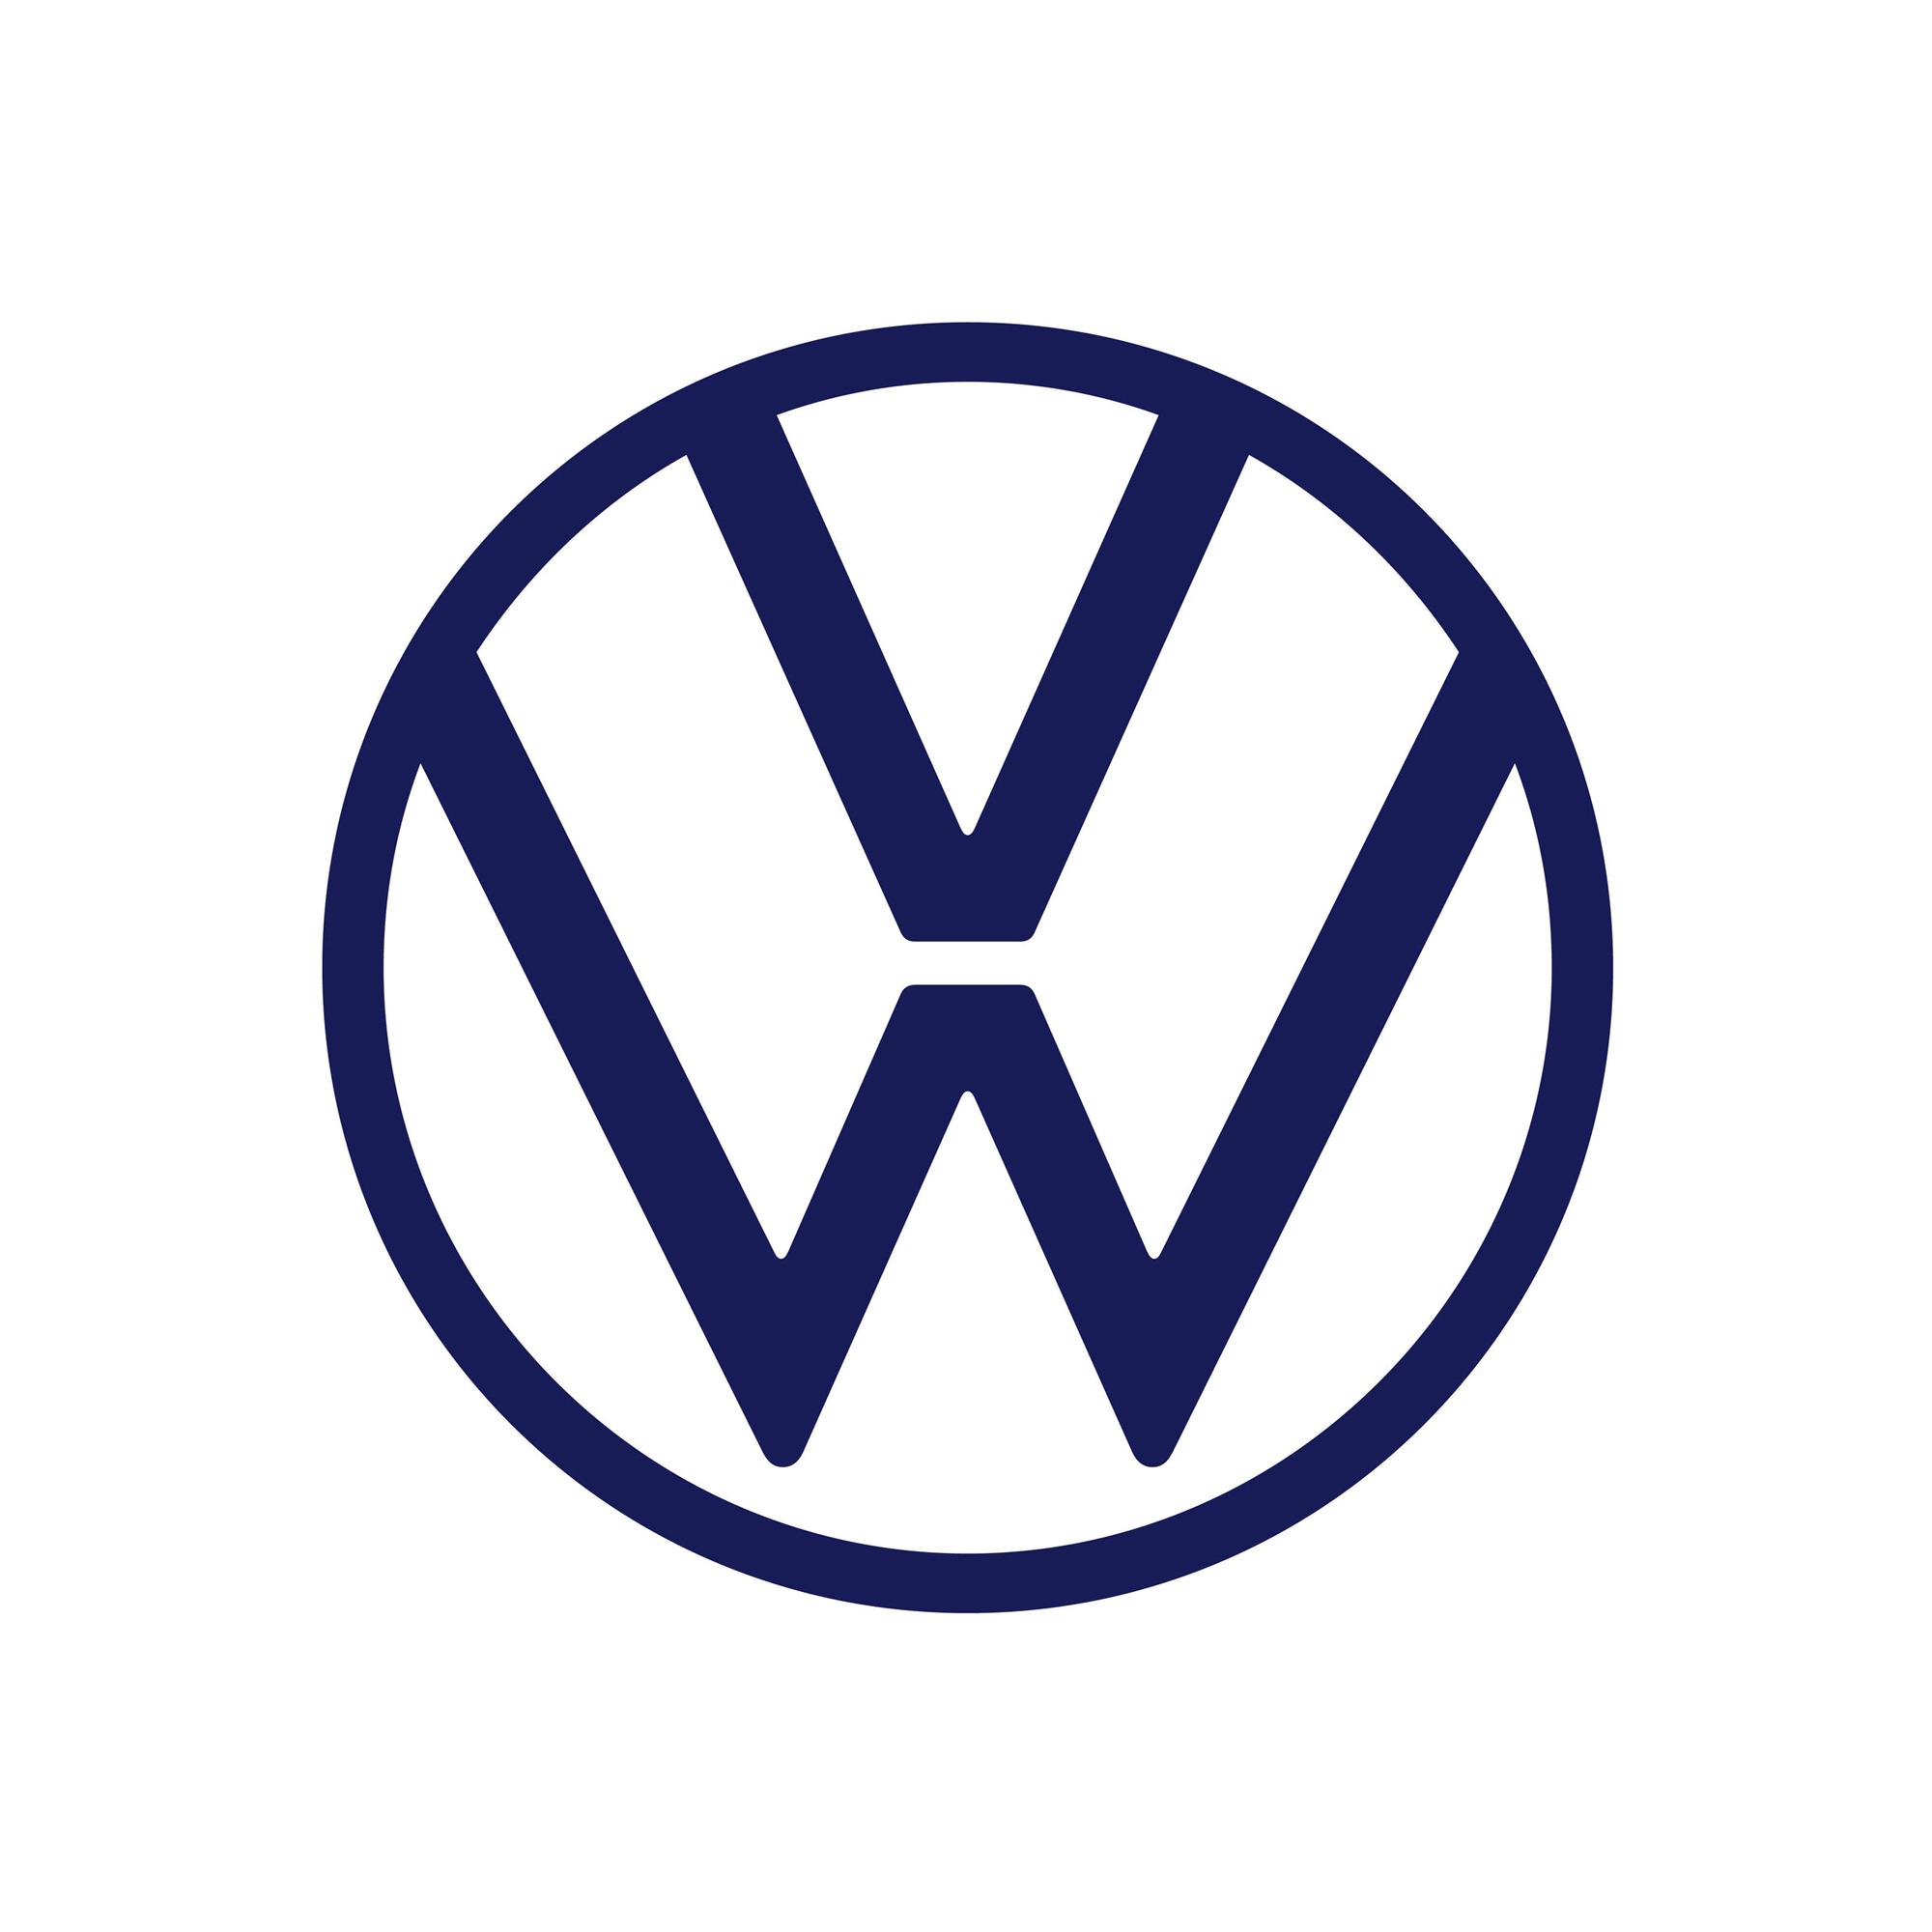 Brand New New Logo And Identity For Volkswagen Done In House Car Brands Logos Volkswagen Logo Volkswagen